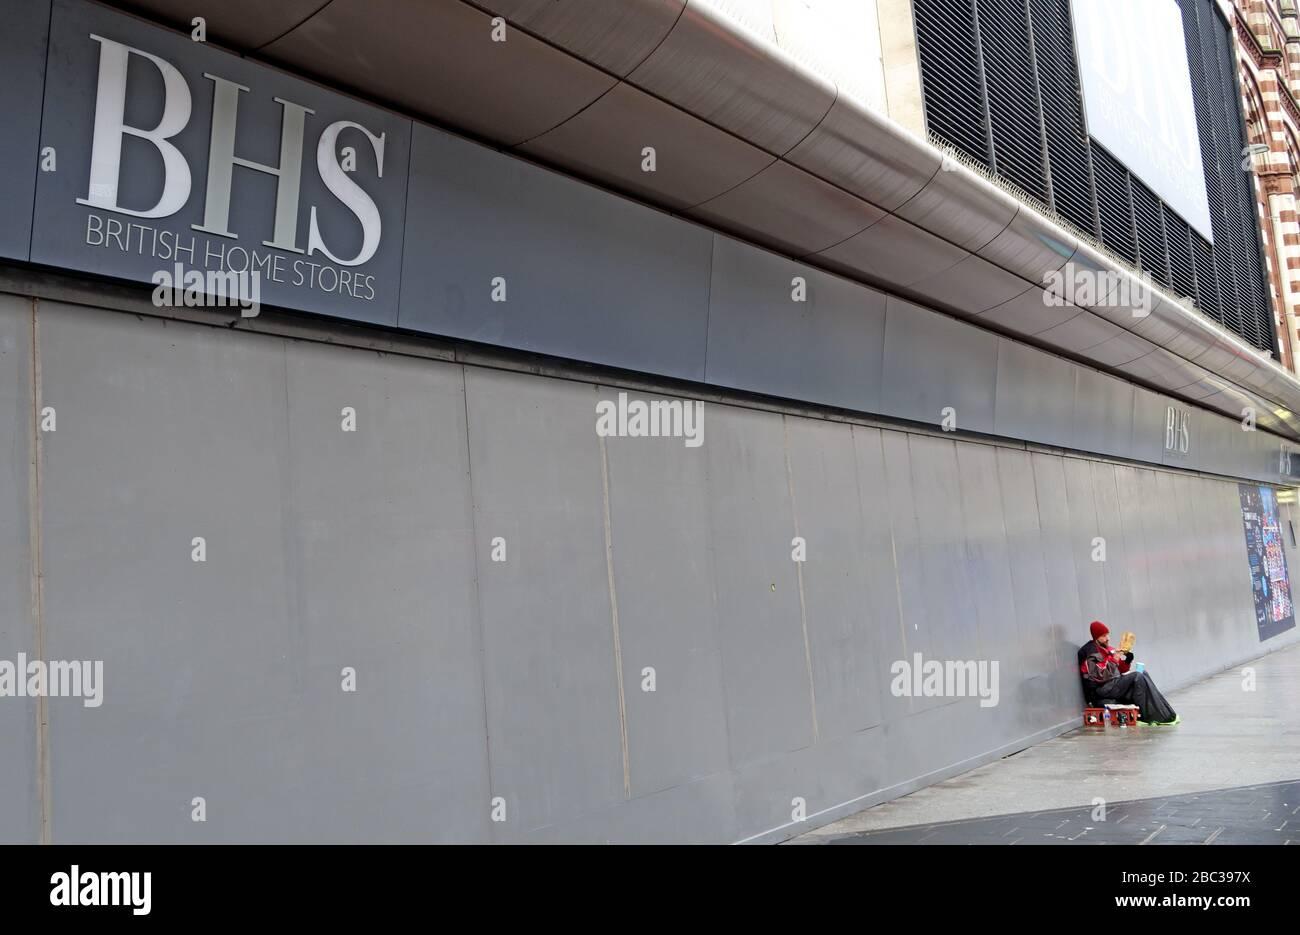 BHS, British Home stores, 67-81 Sauchiehall Street, Glasgow, Scotland, UK Stock Photo